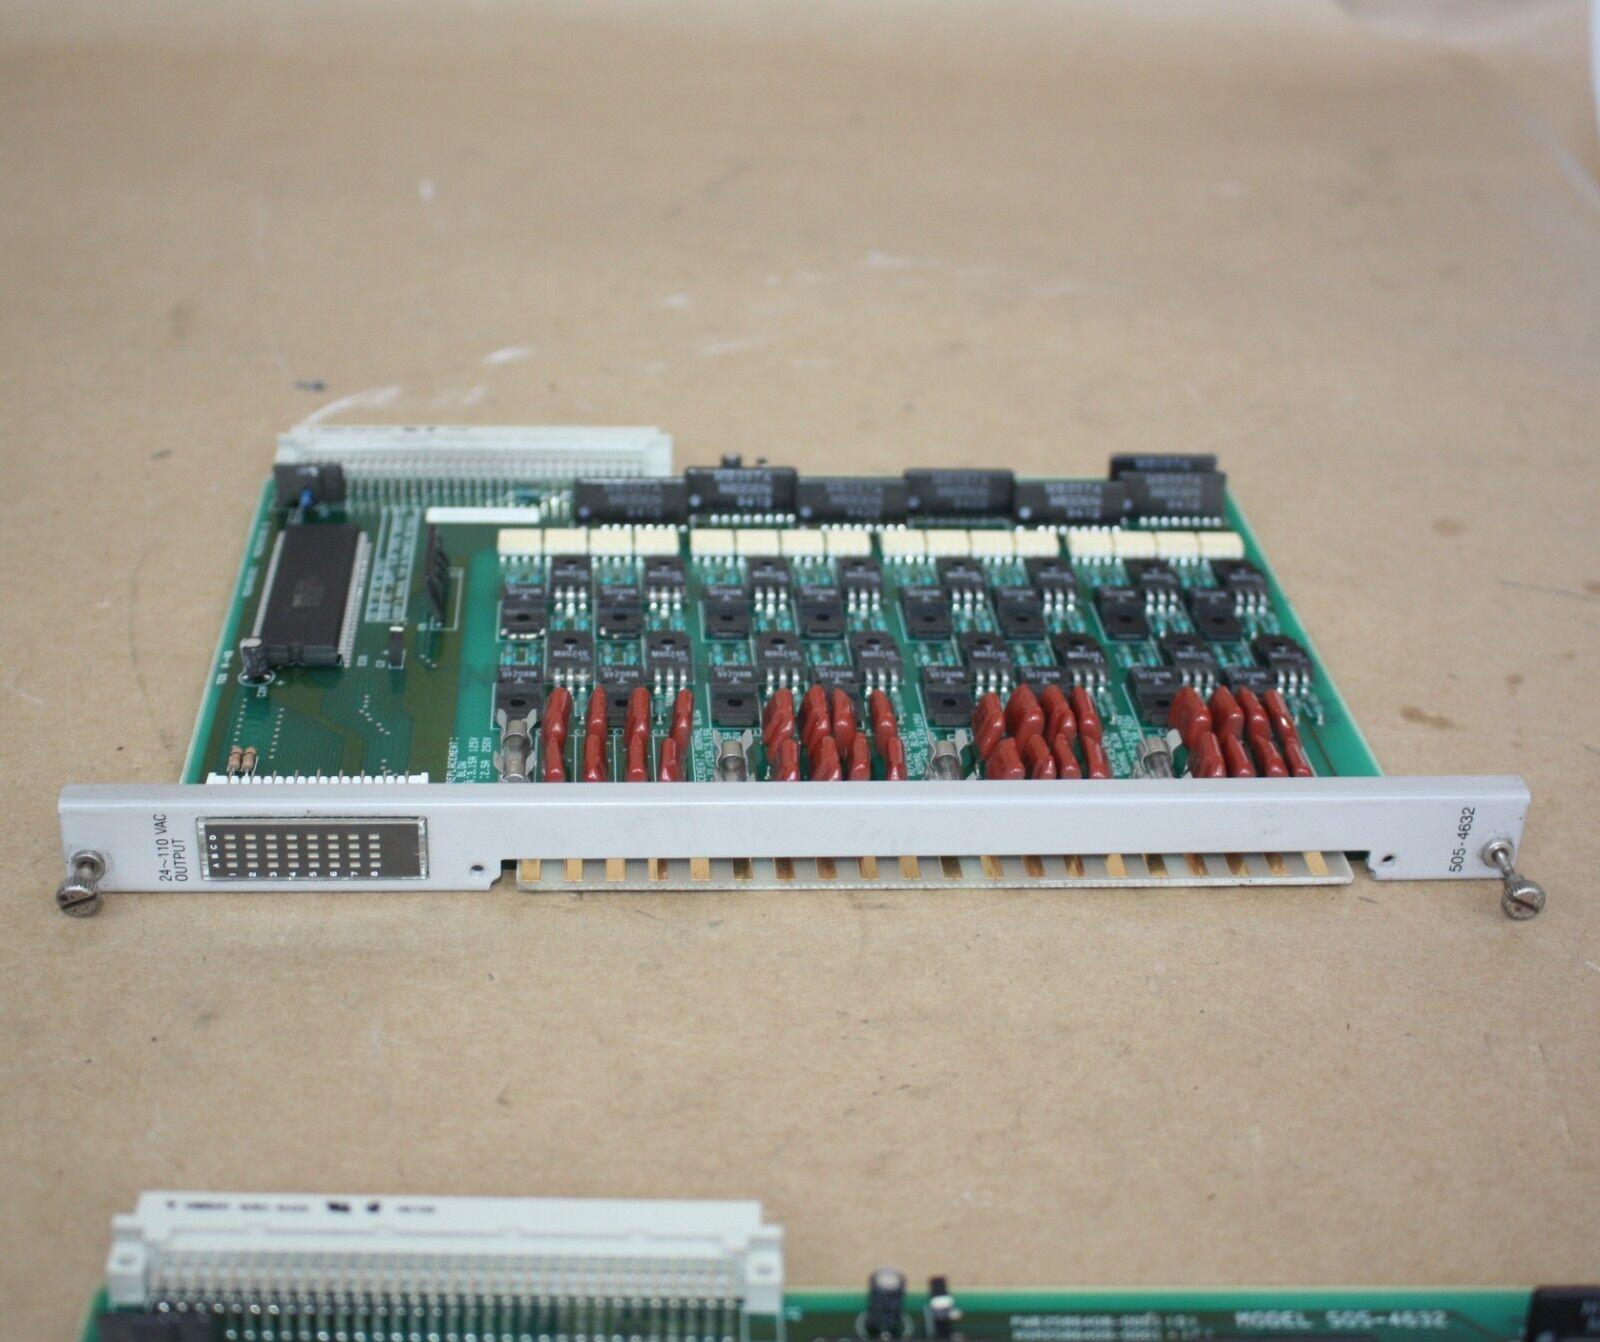 SIEMENS SIMATIC 505-4632 24110VAC OUTPUT MODULE PLC - TEXAS INSTRUMENTS TI 505